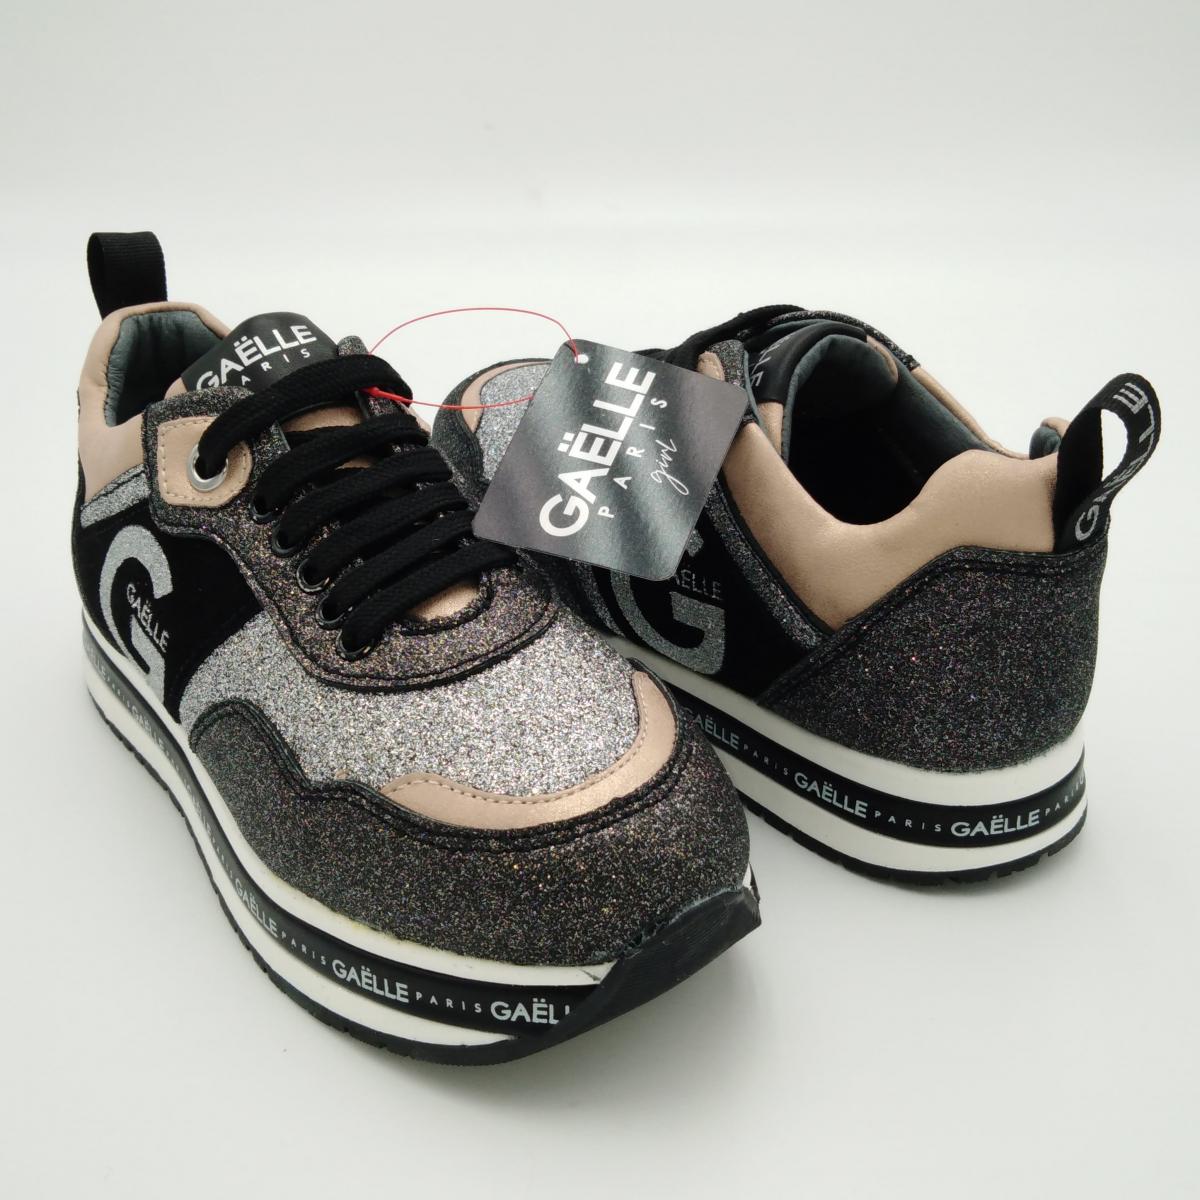 Gaelle Paris -Sneaker...